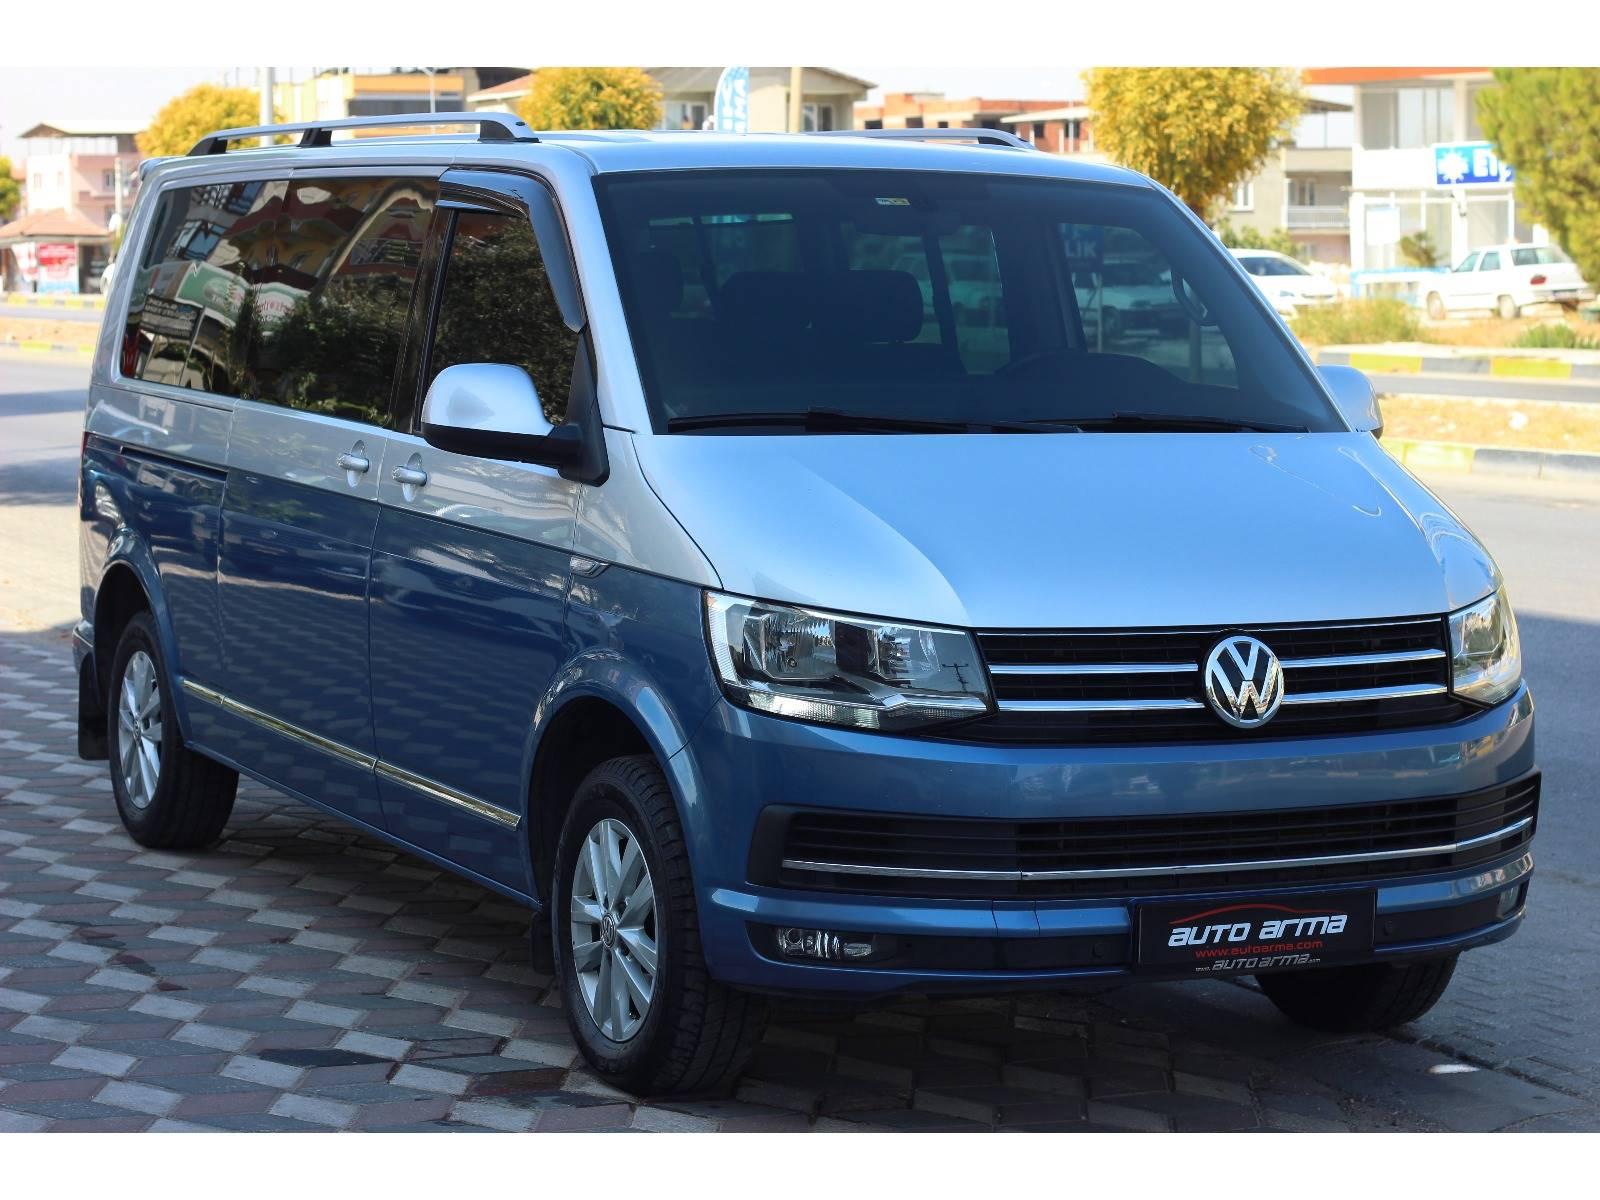 Volkswagen Caravelle DSG